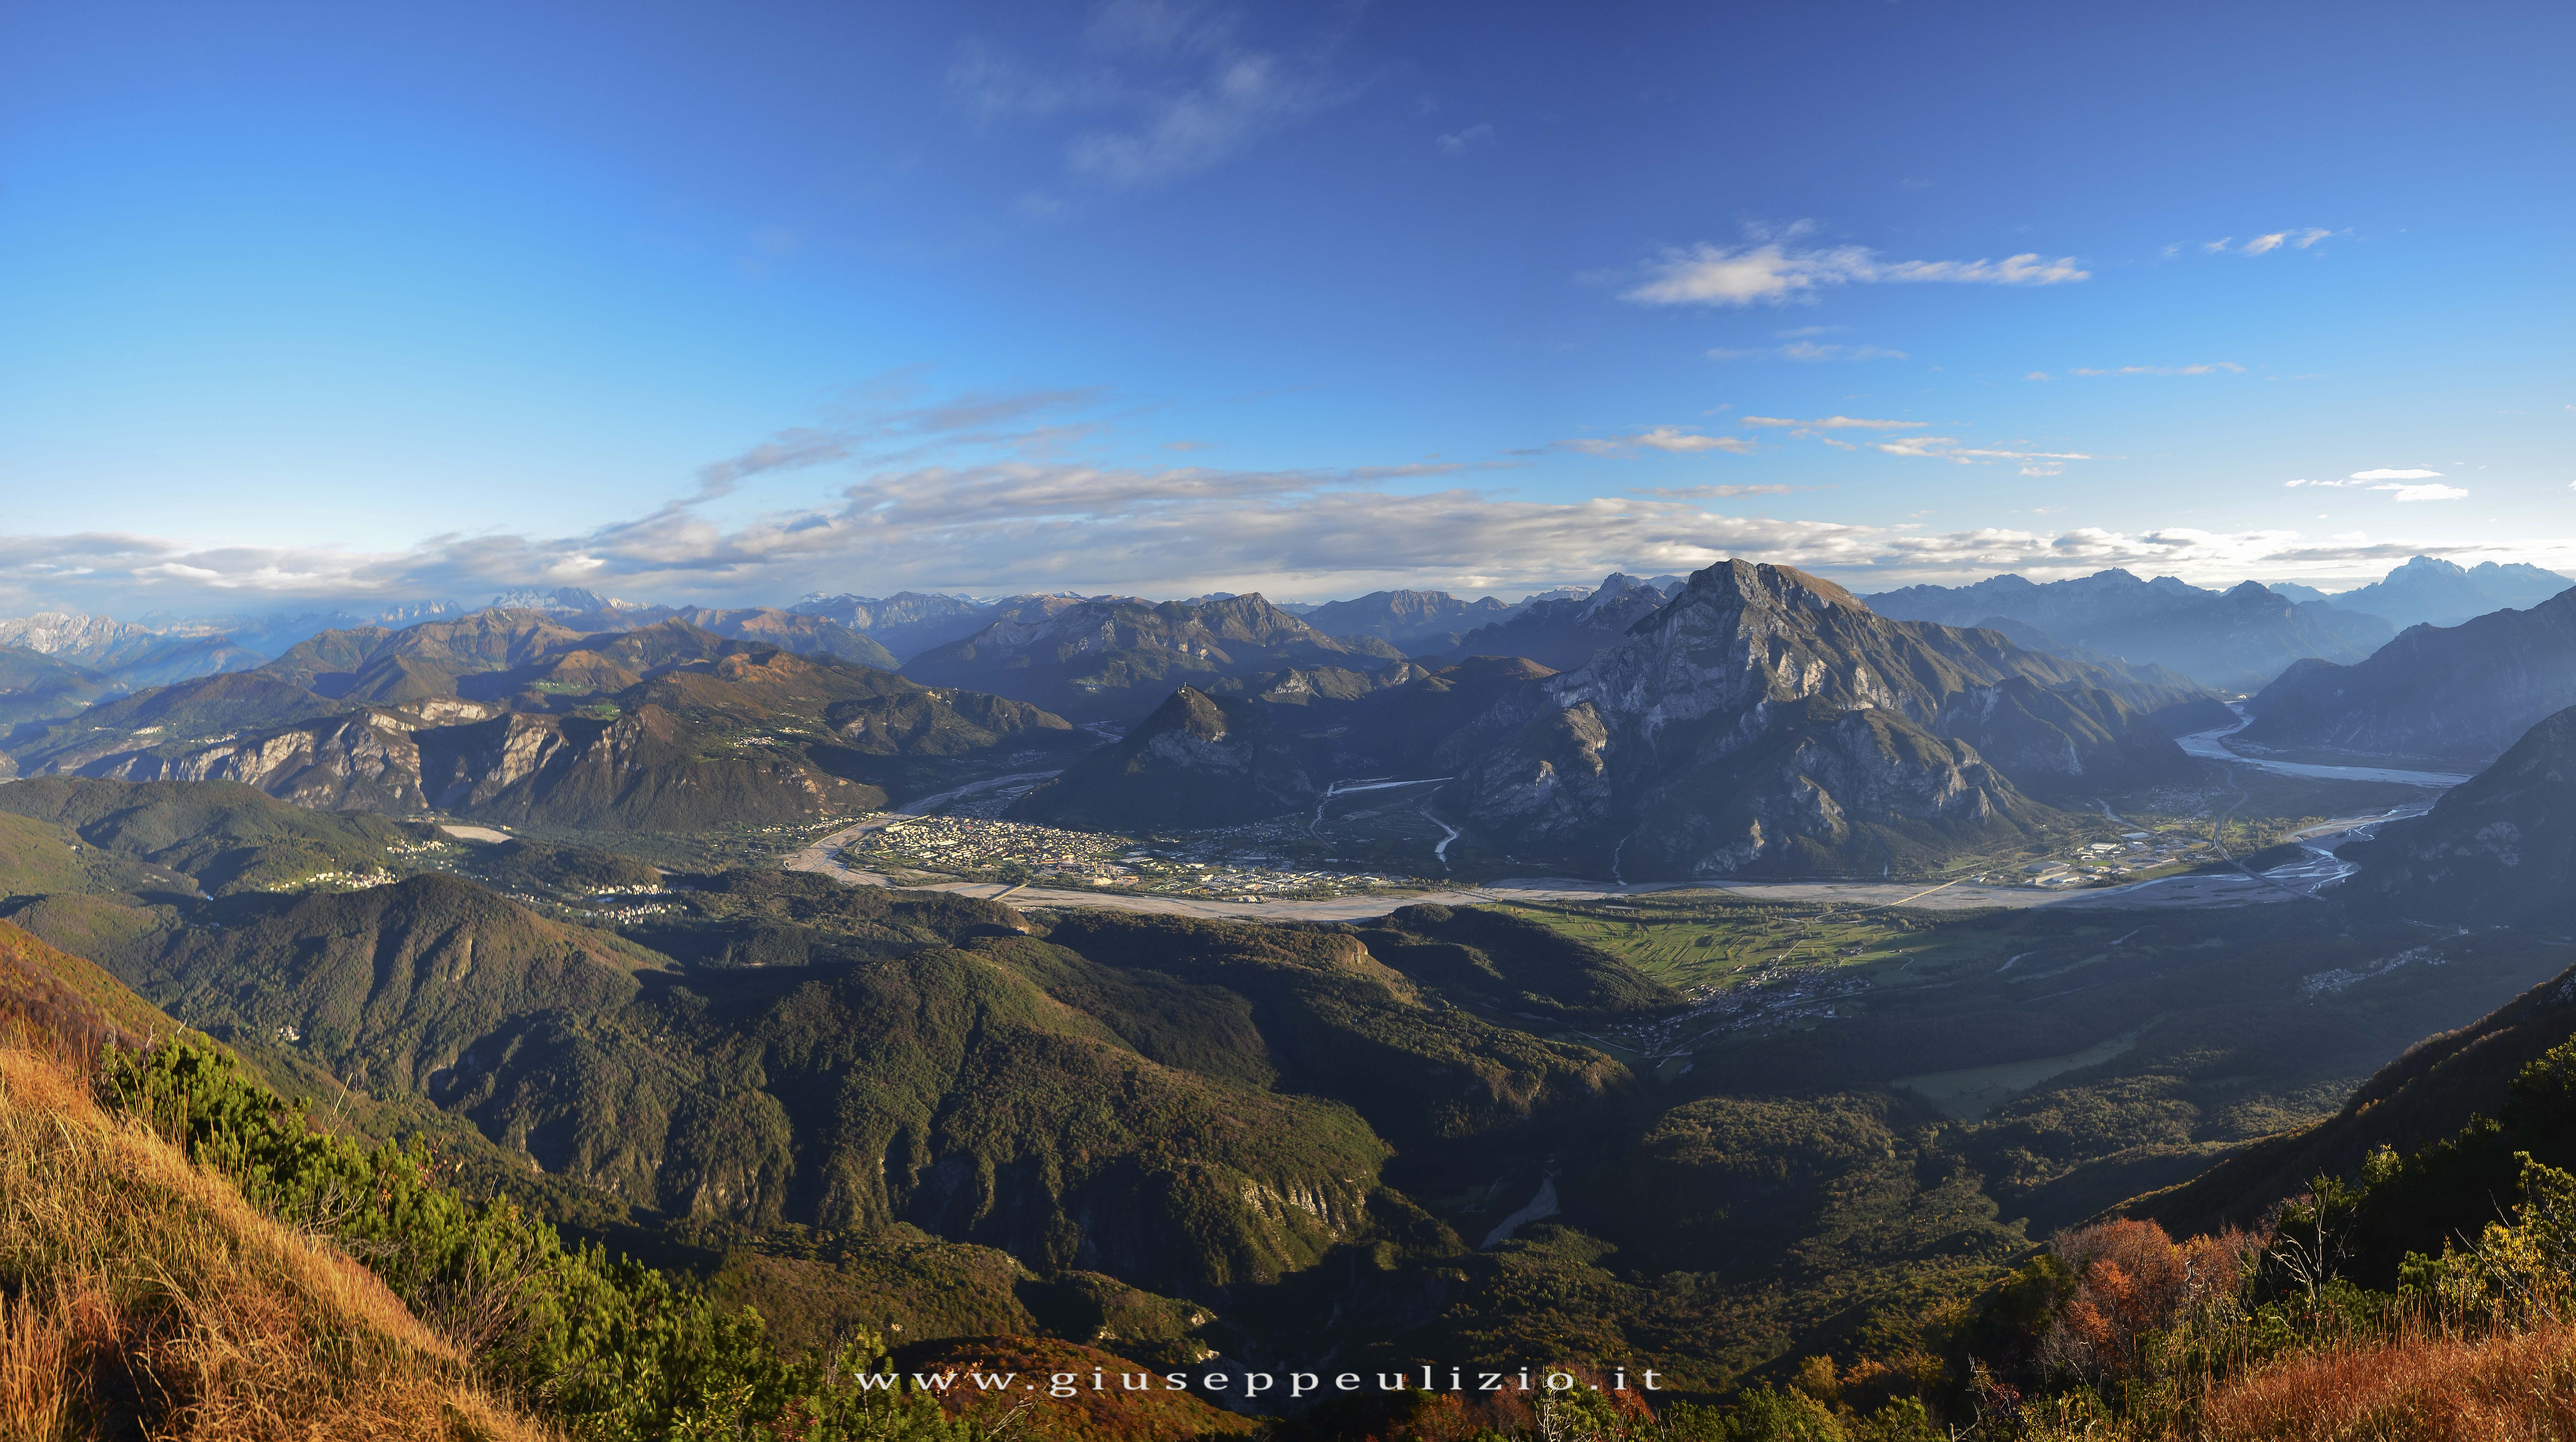 panoramica conca tolmezzina dal picjat.jpg